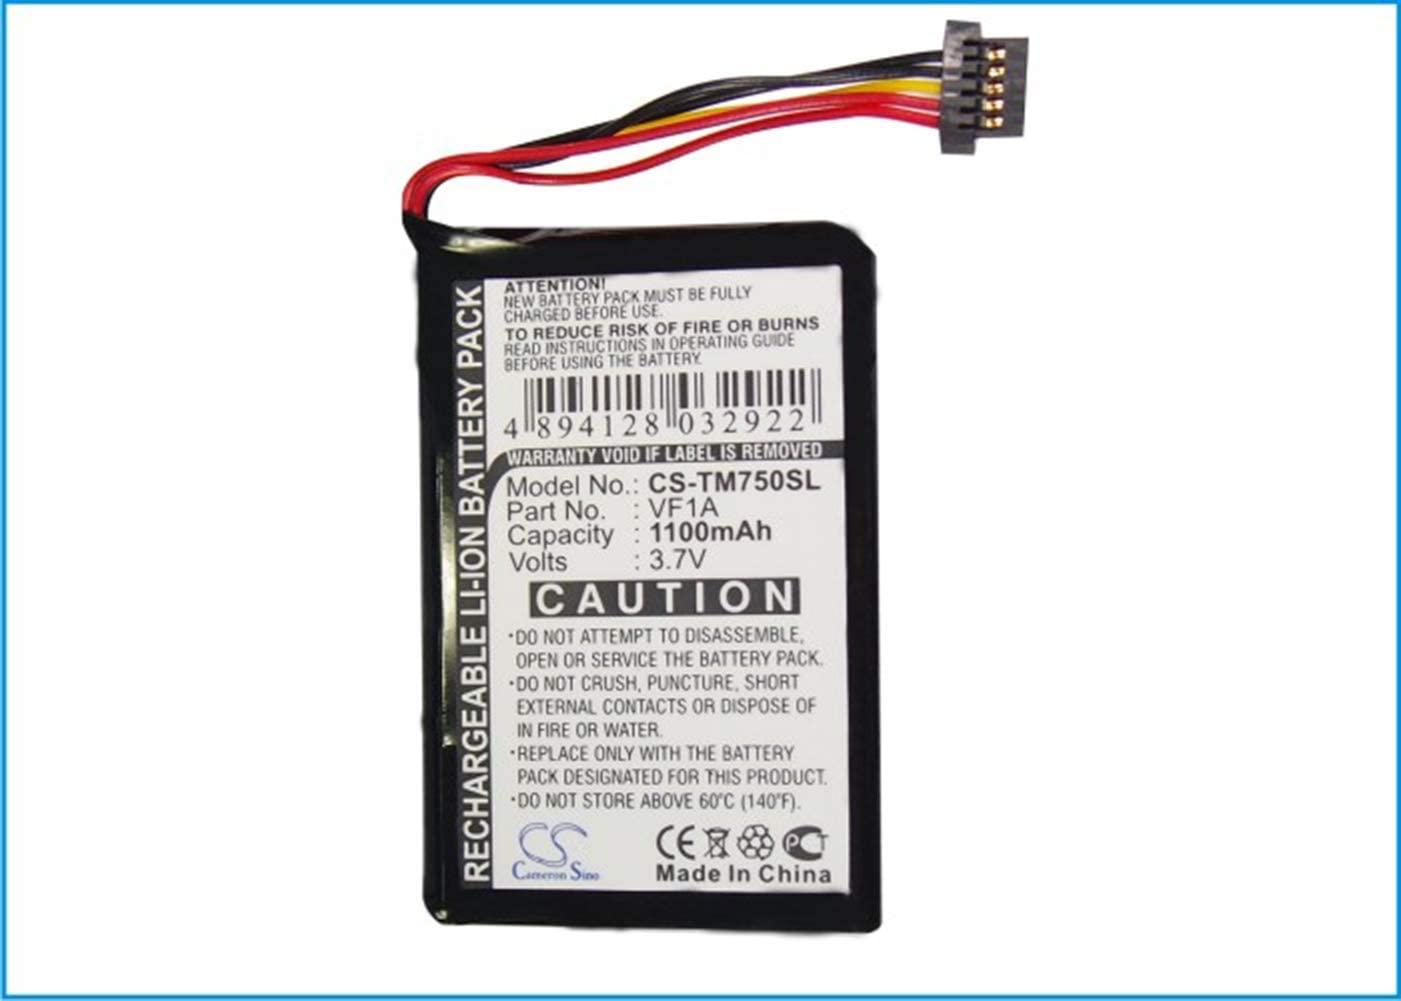 Cameron Sino 3.7V/1100mA AHL03711012,HM9440232488,VF1A Replacement Battery for Tomtom 4CP0.002.06,Go 740 Live,Go 740TM,Go 750,Go 750 Live Battery